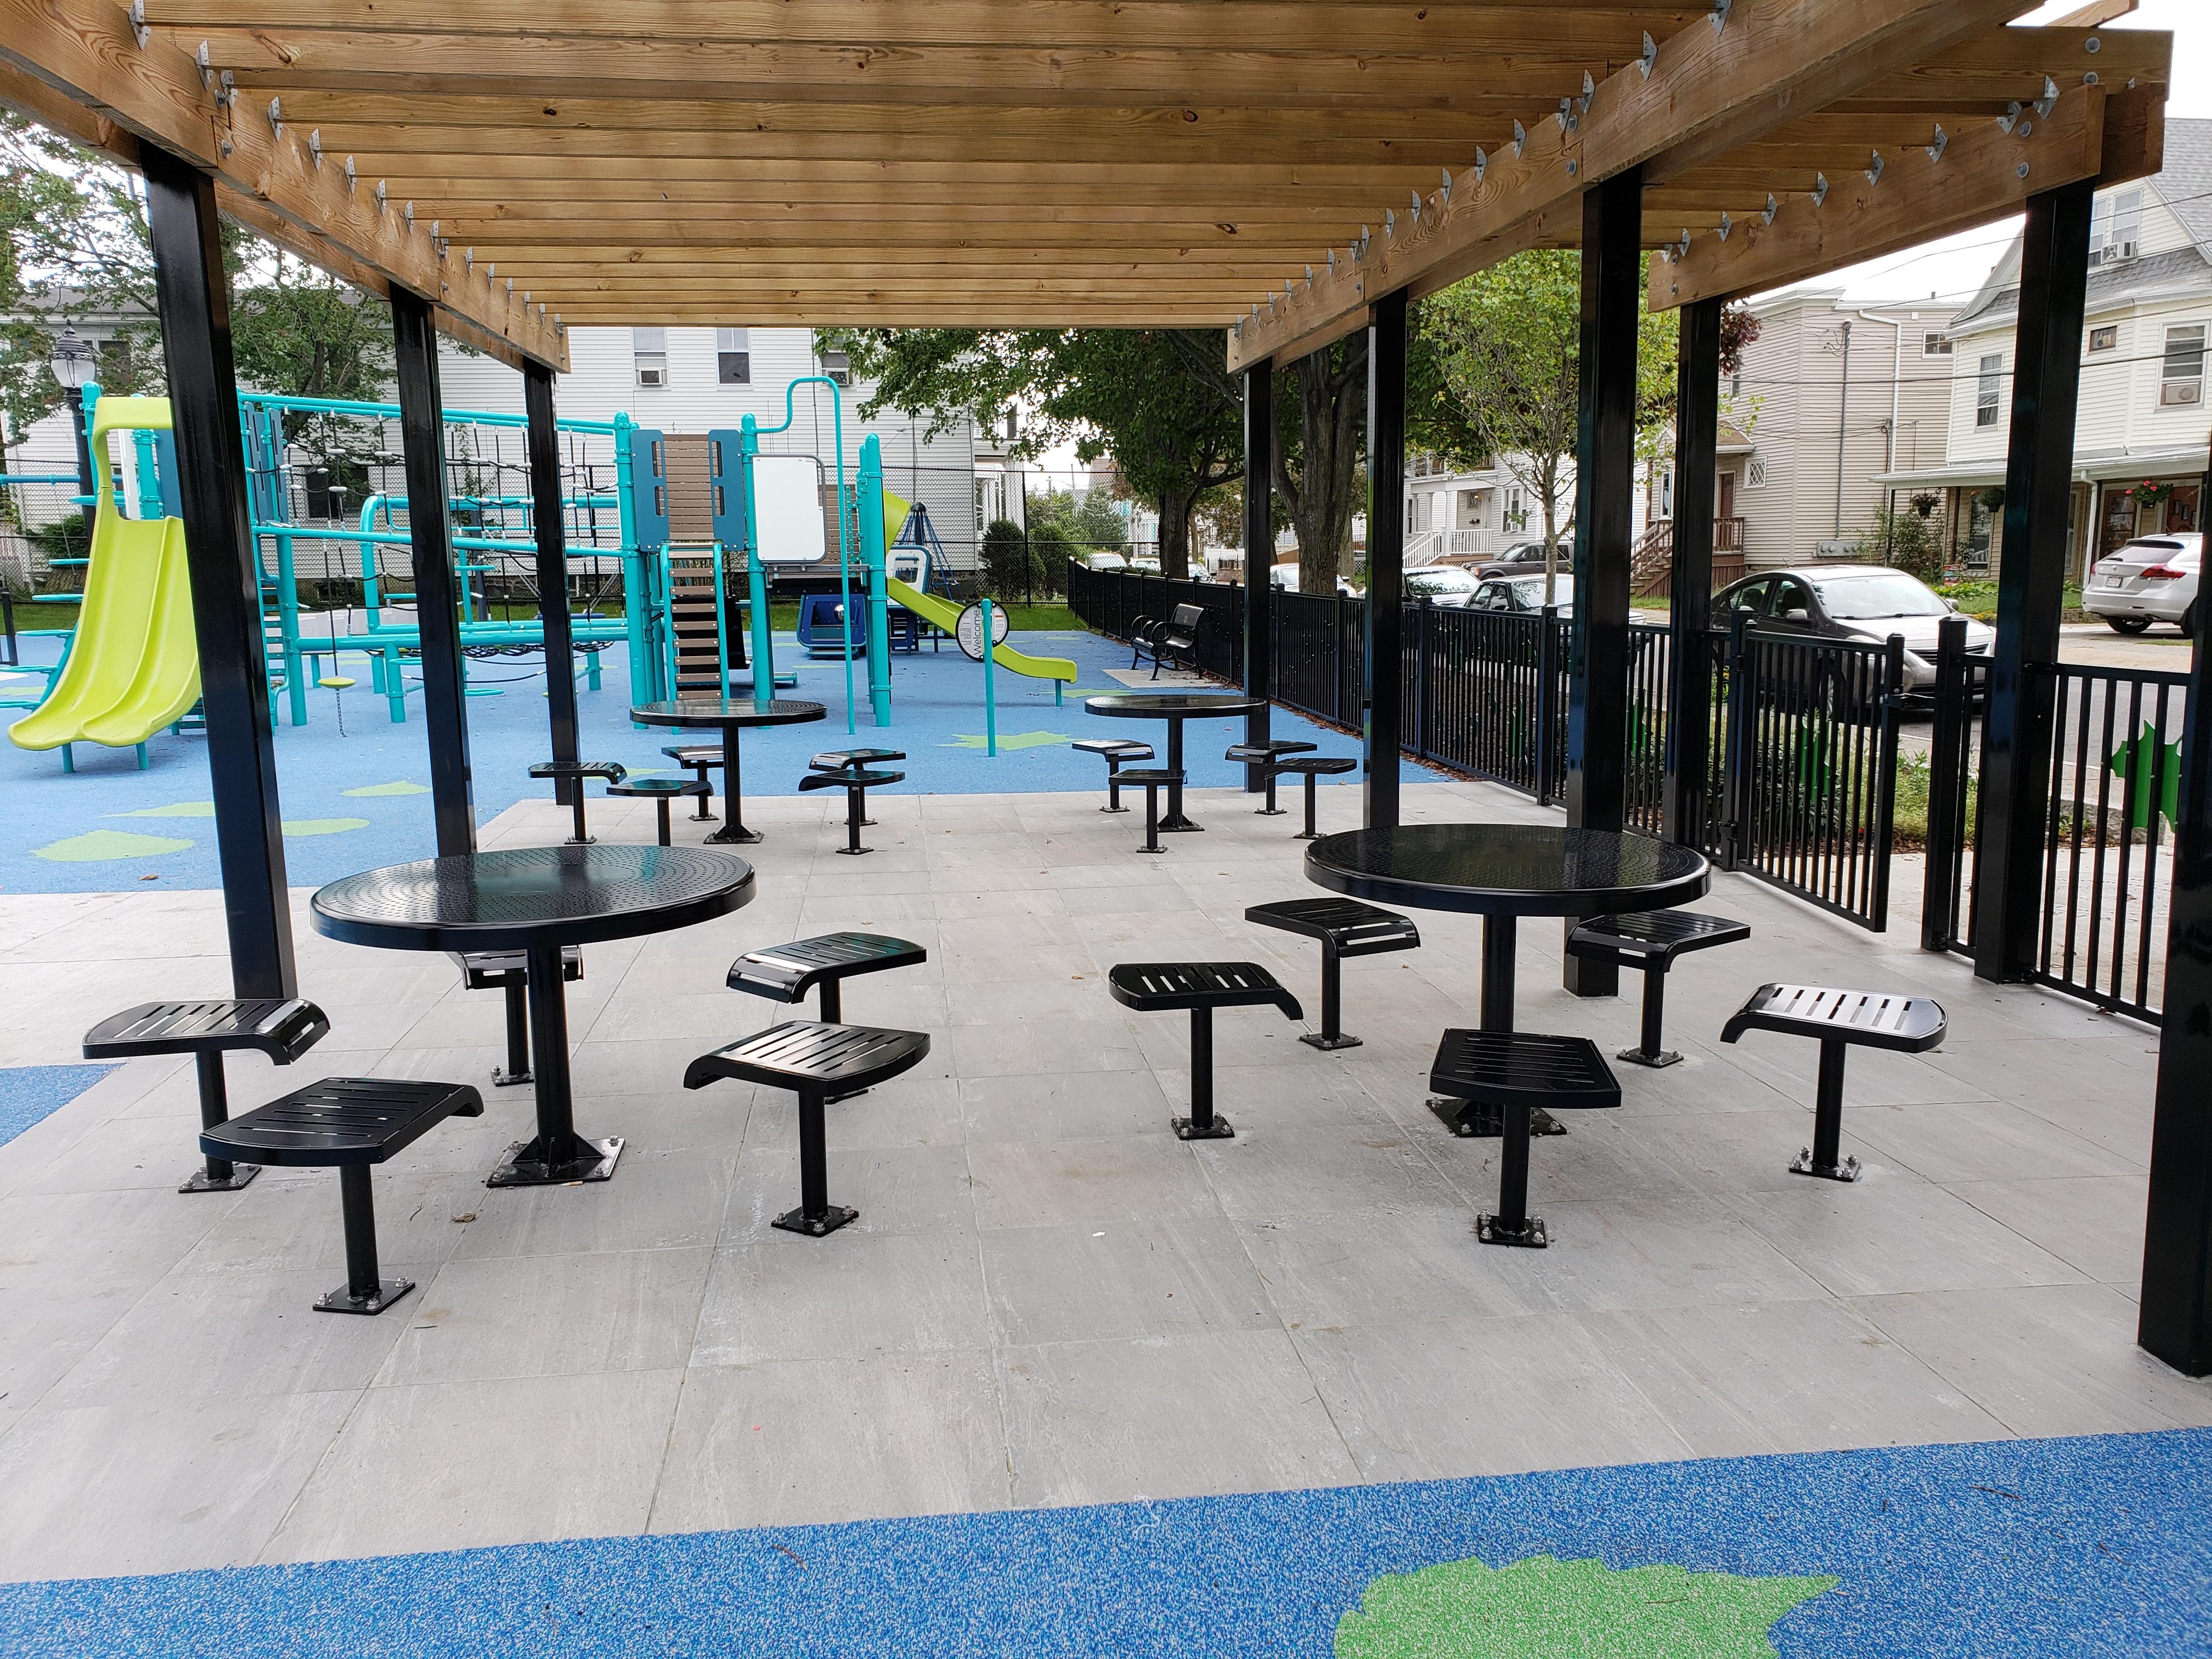 DuMor Picnic Tables, Landscape Structures Playground Gramstorff Park Massachusetts